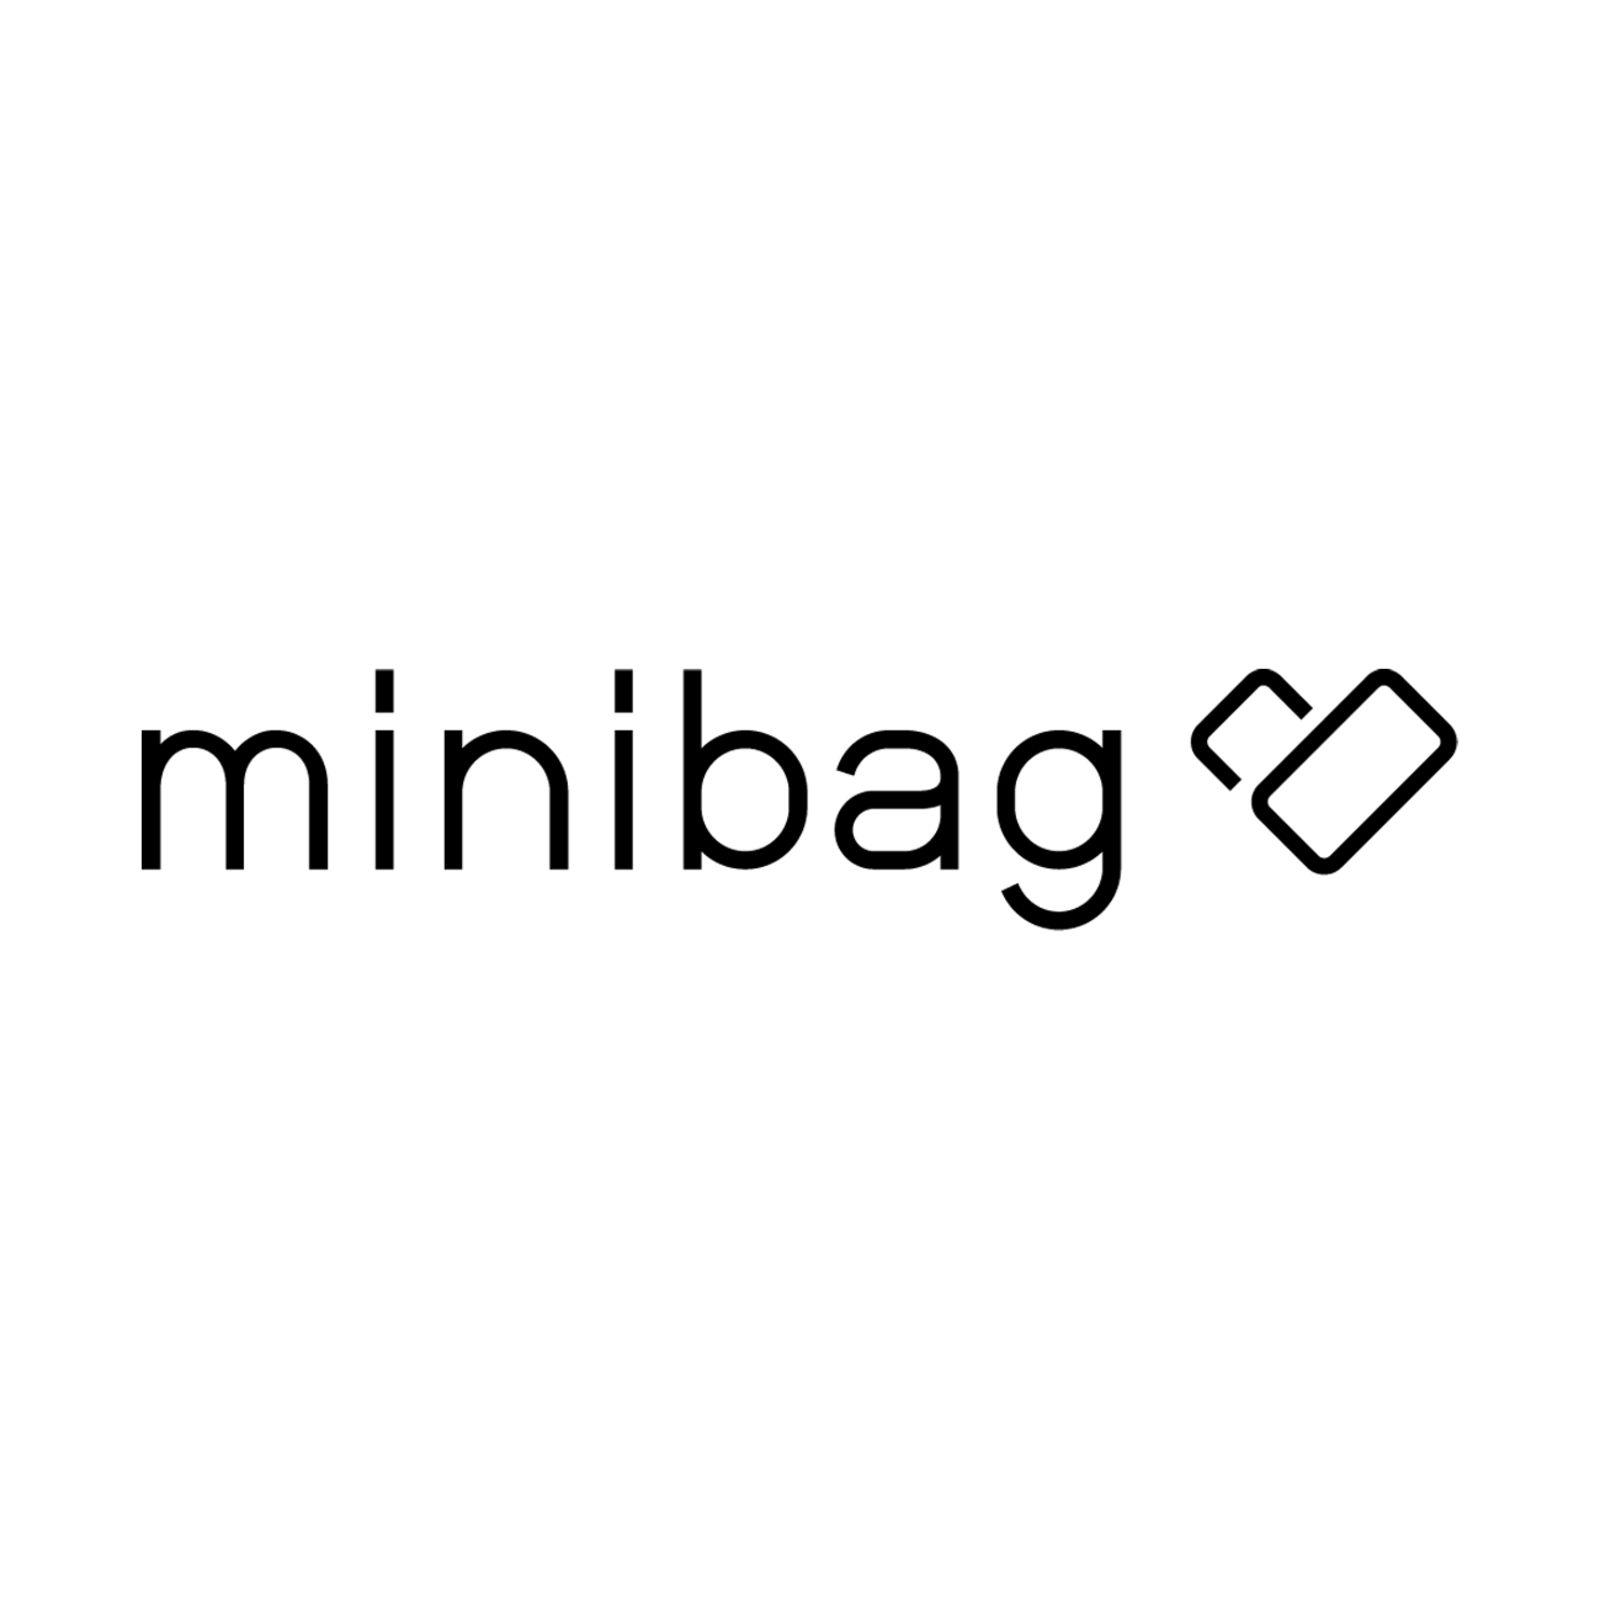 minibag (Bild 1)